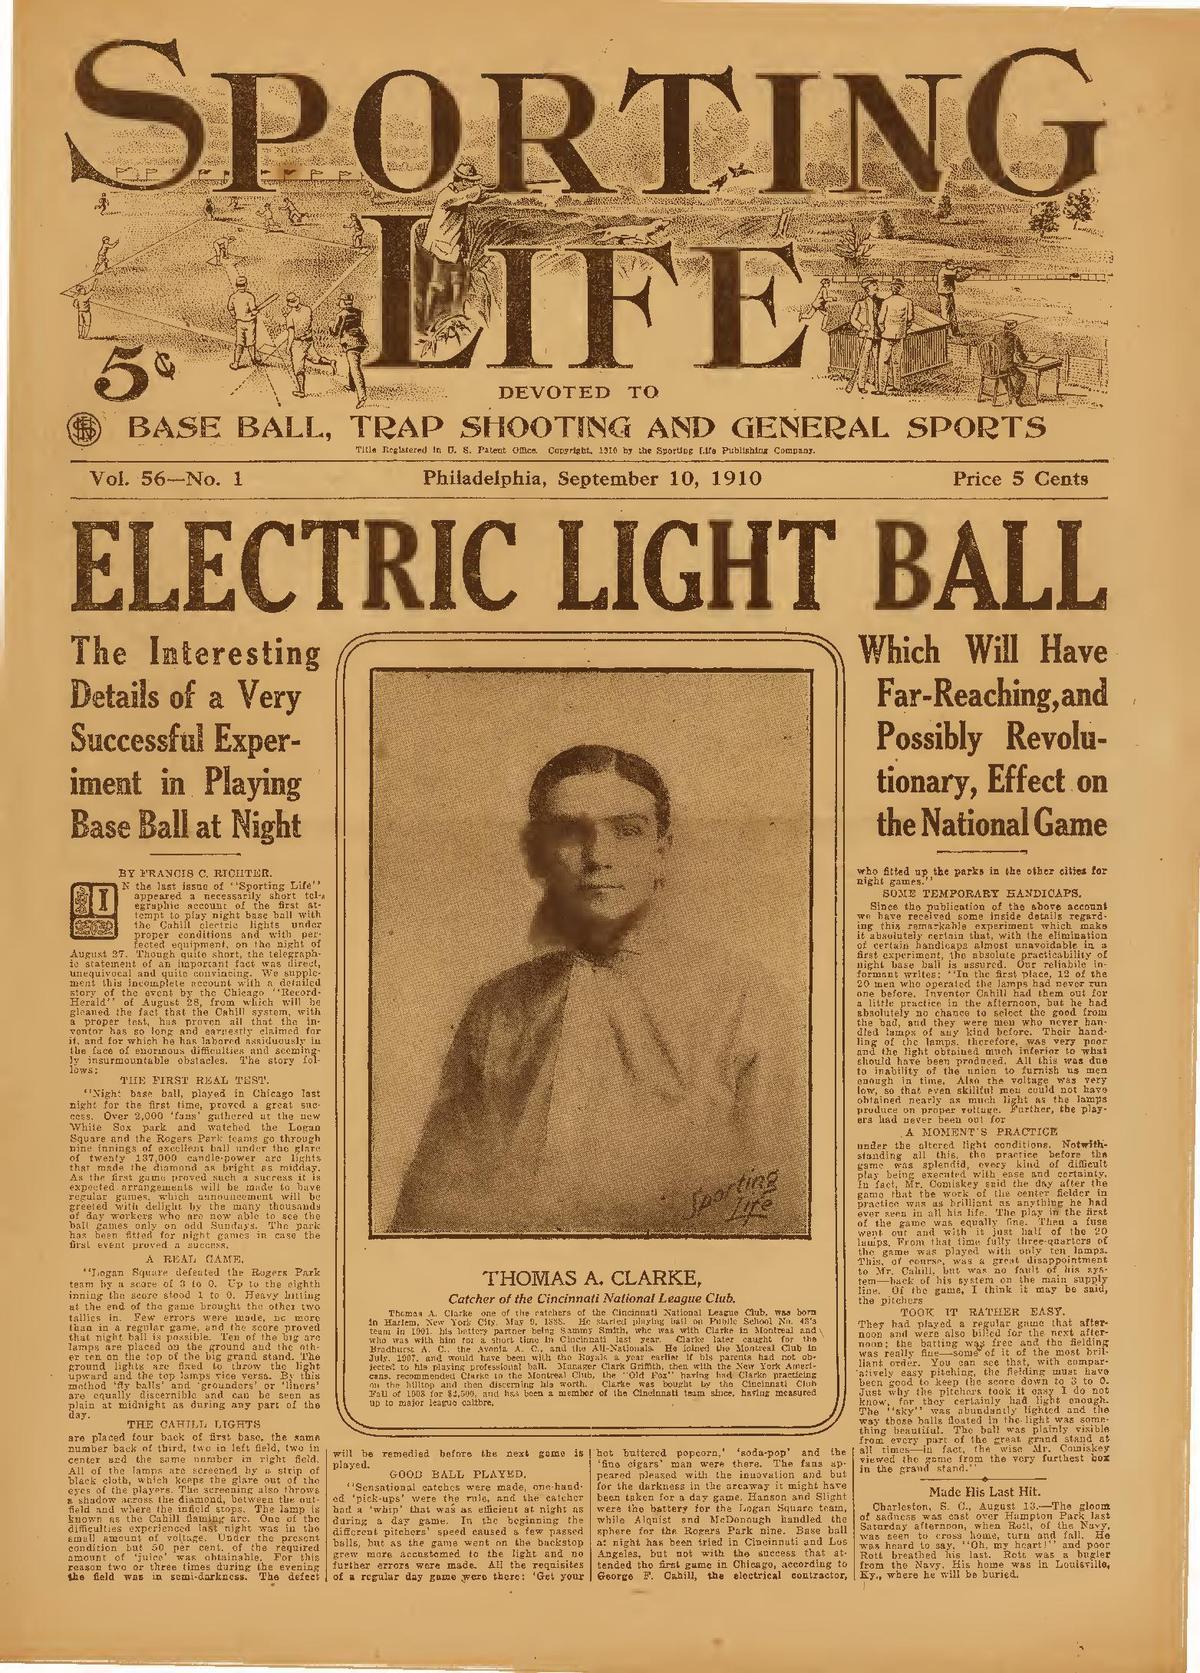 Sporting Life (American newspaper) - Wikipedia